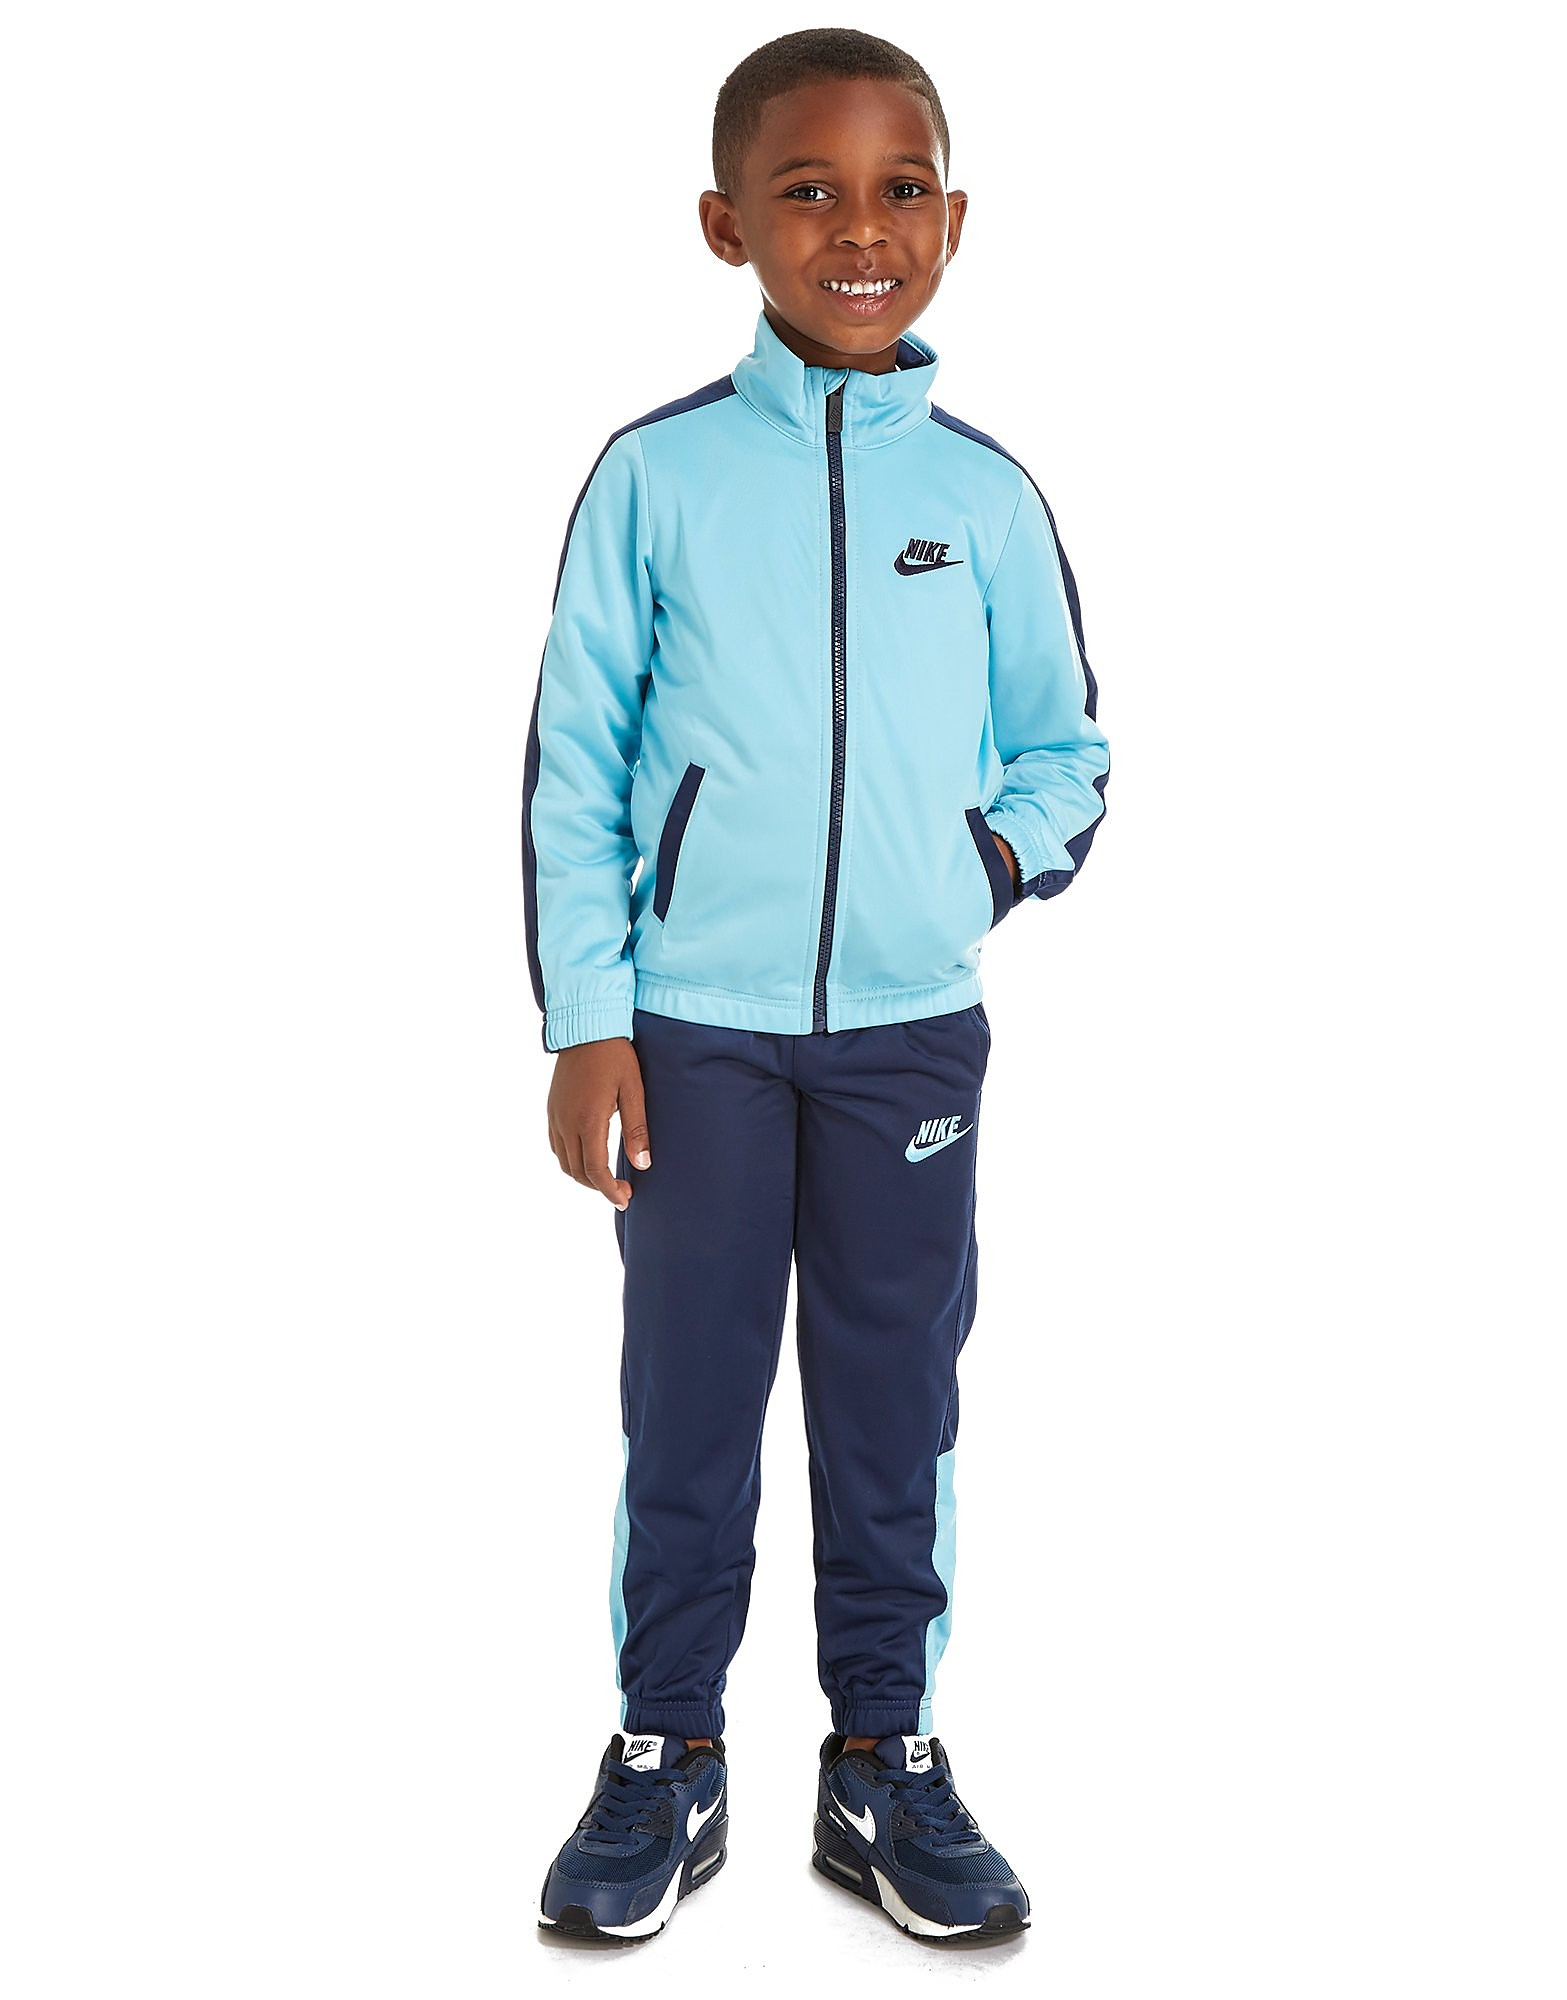 Nike Tribute Tracksuit Children